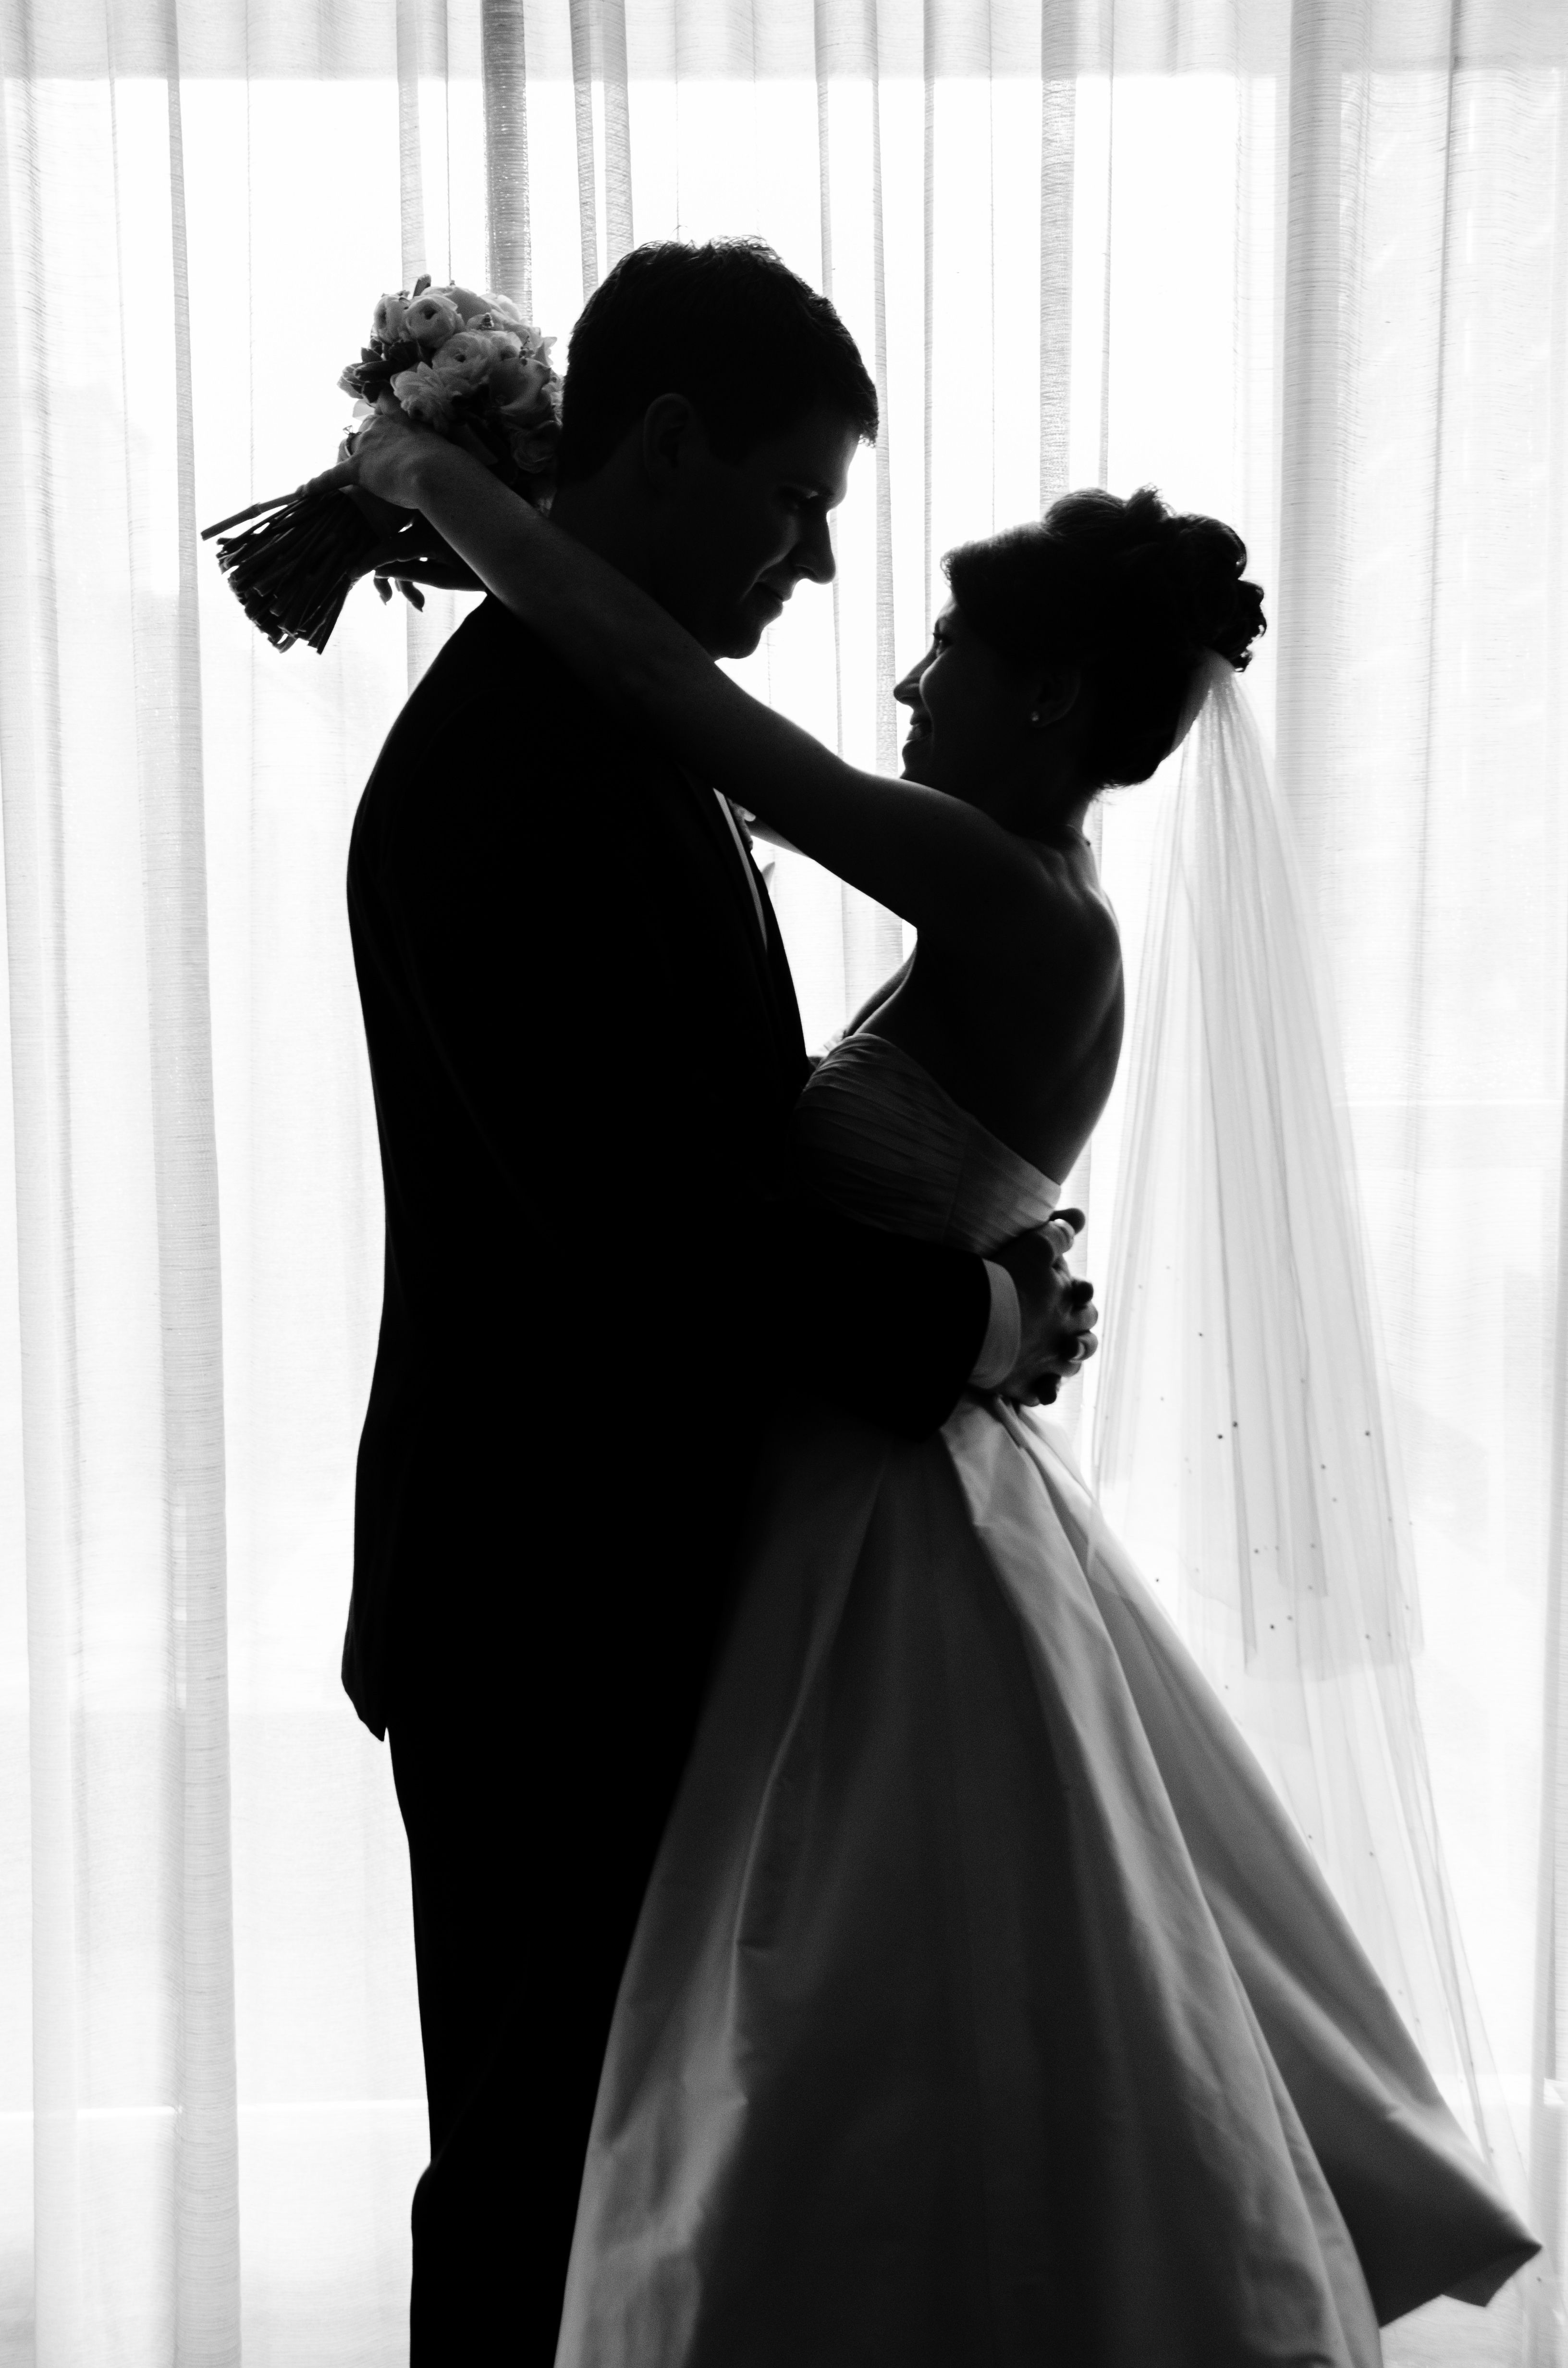 tumblr bride groom silhouette ekenasfiber johnhenriksson se u2022 rh ekenasfiber johnhenriksson se